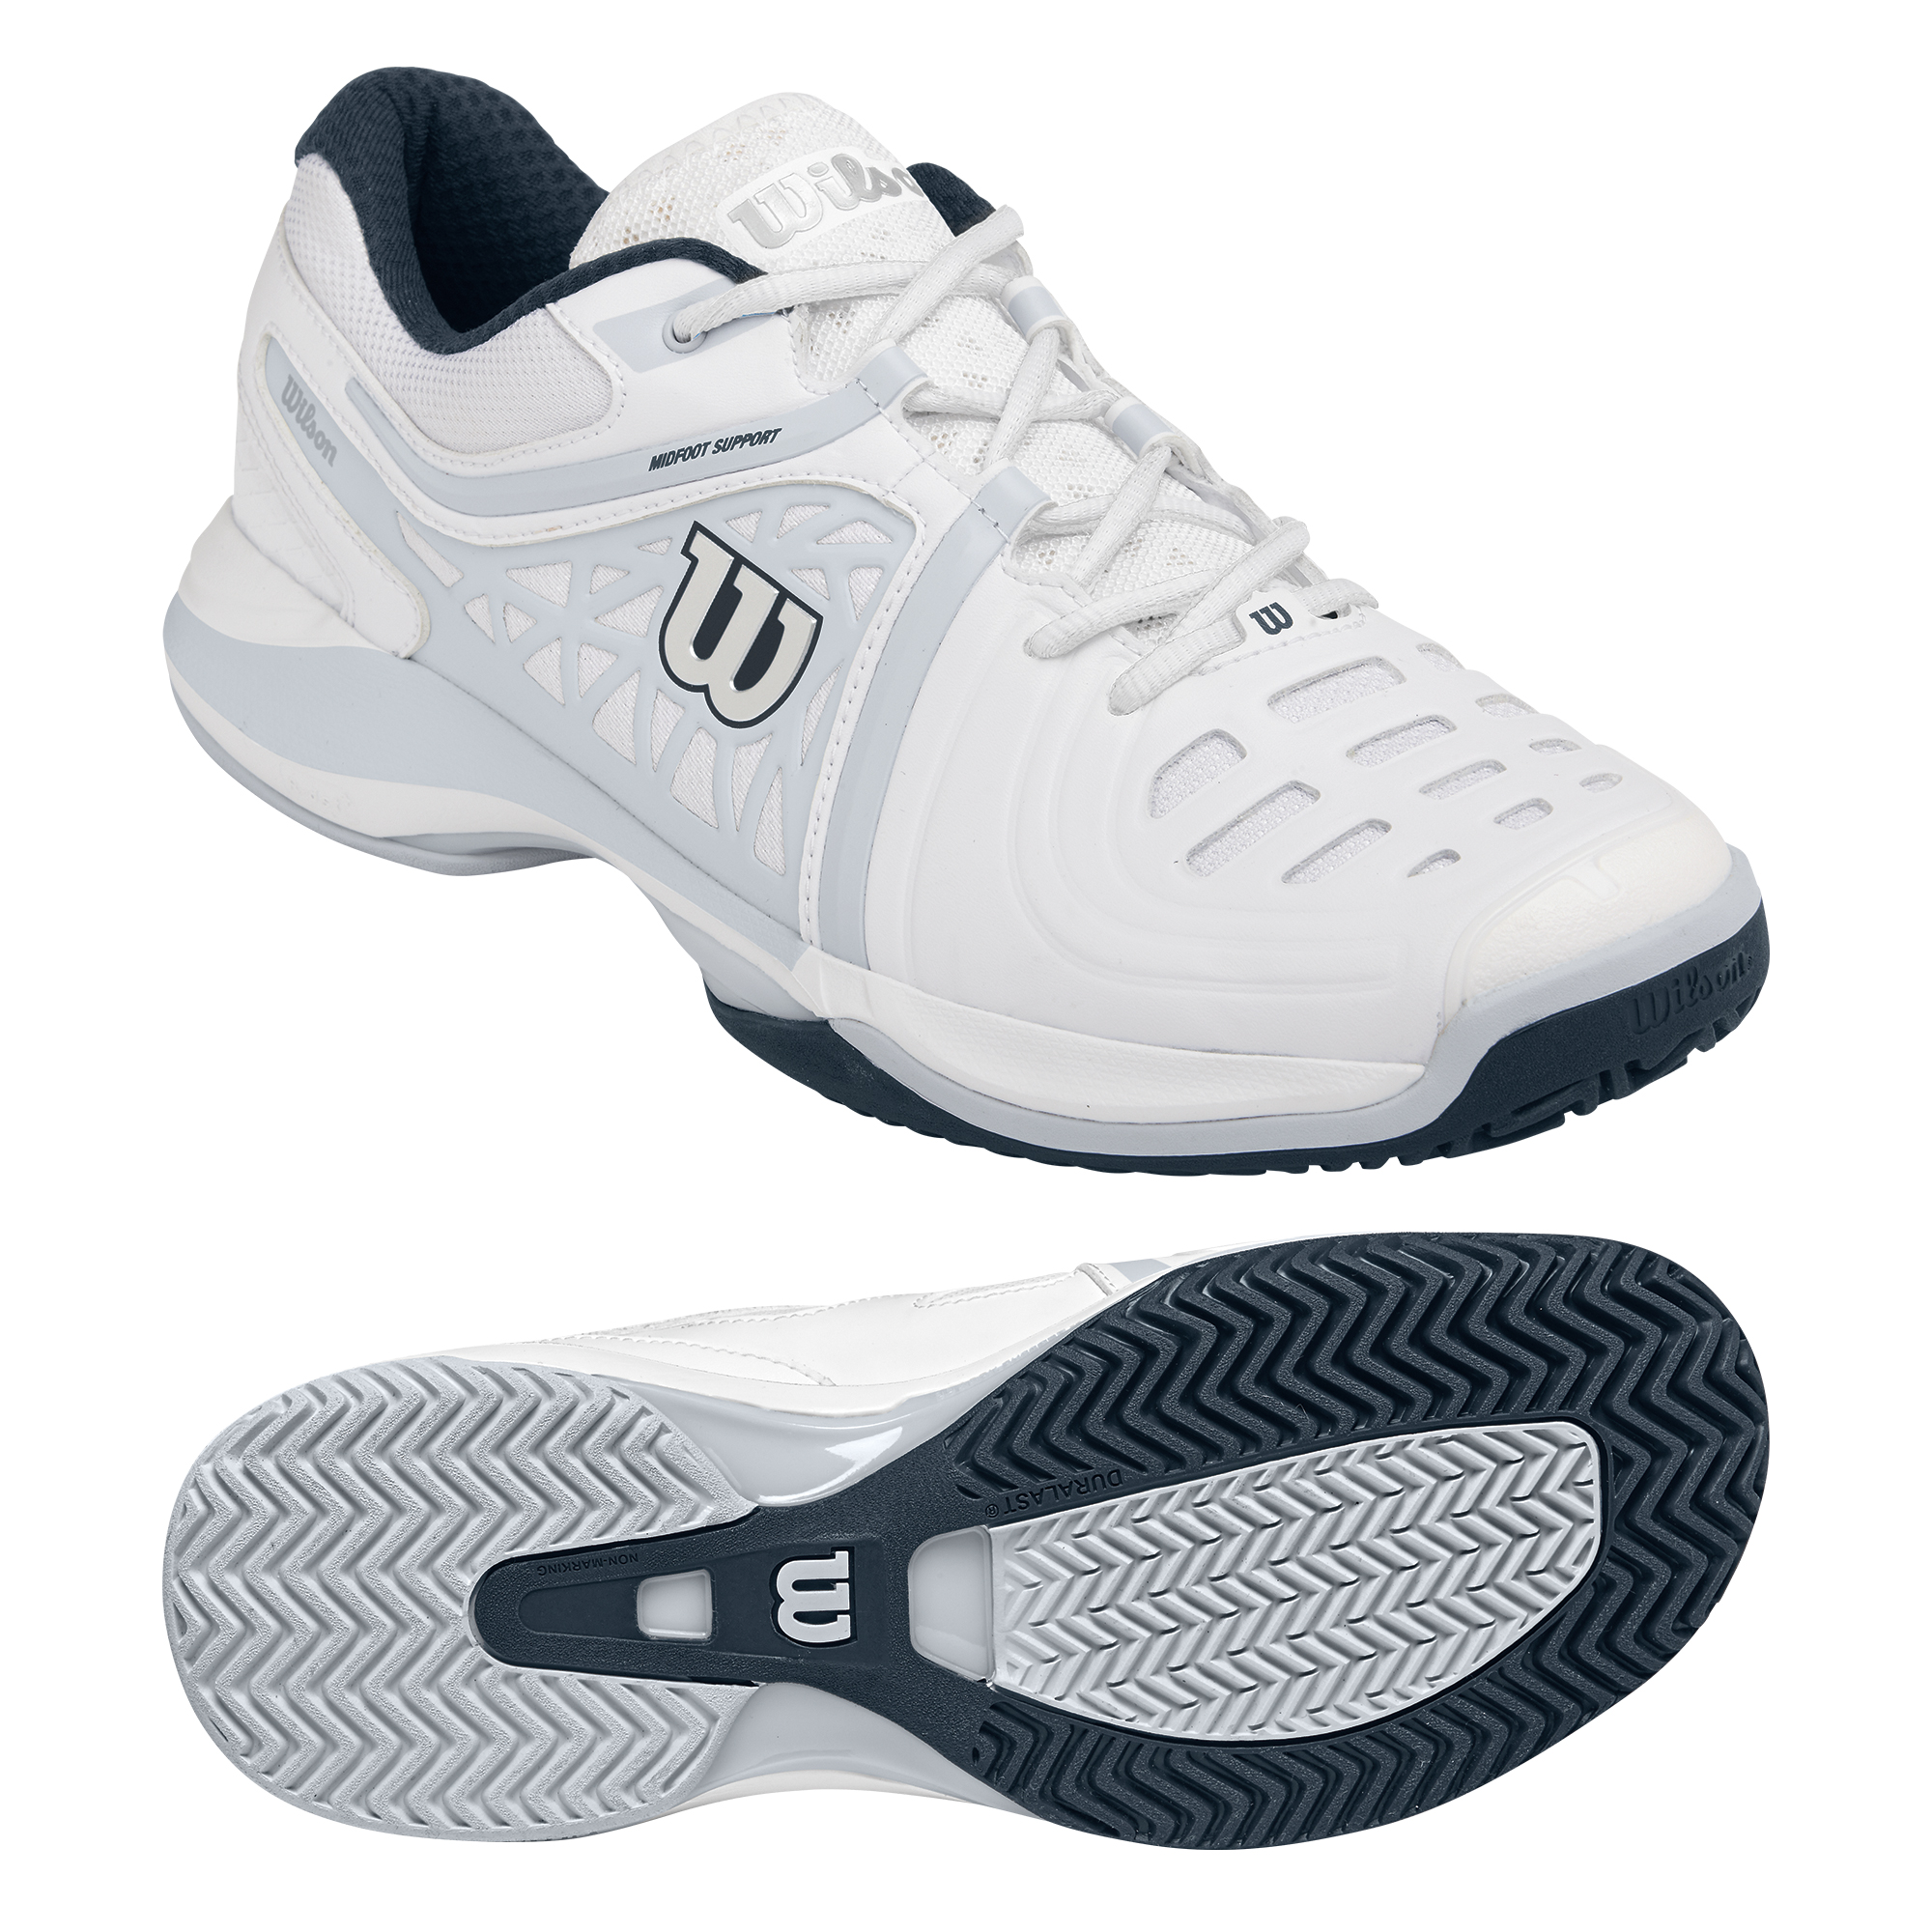 wilson nvision envy mens tennis shoes 8 uk